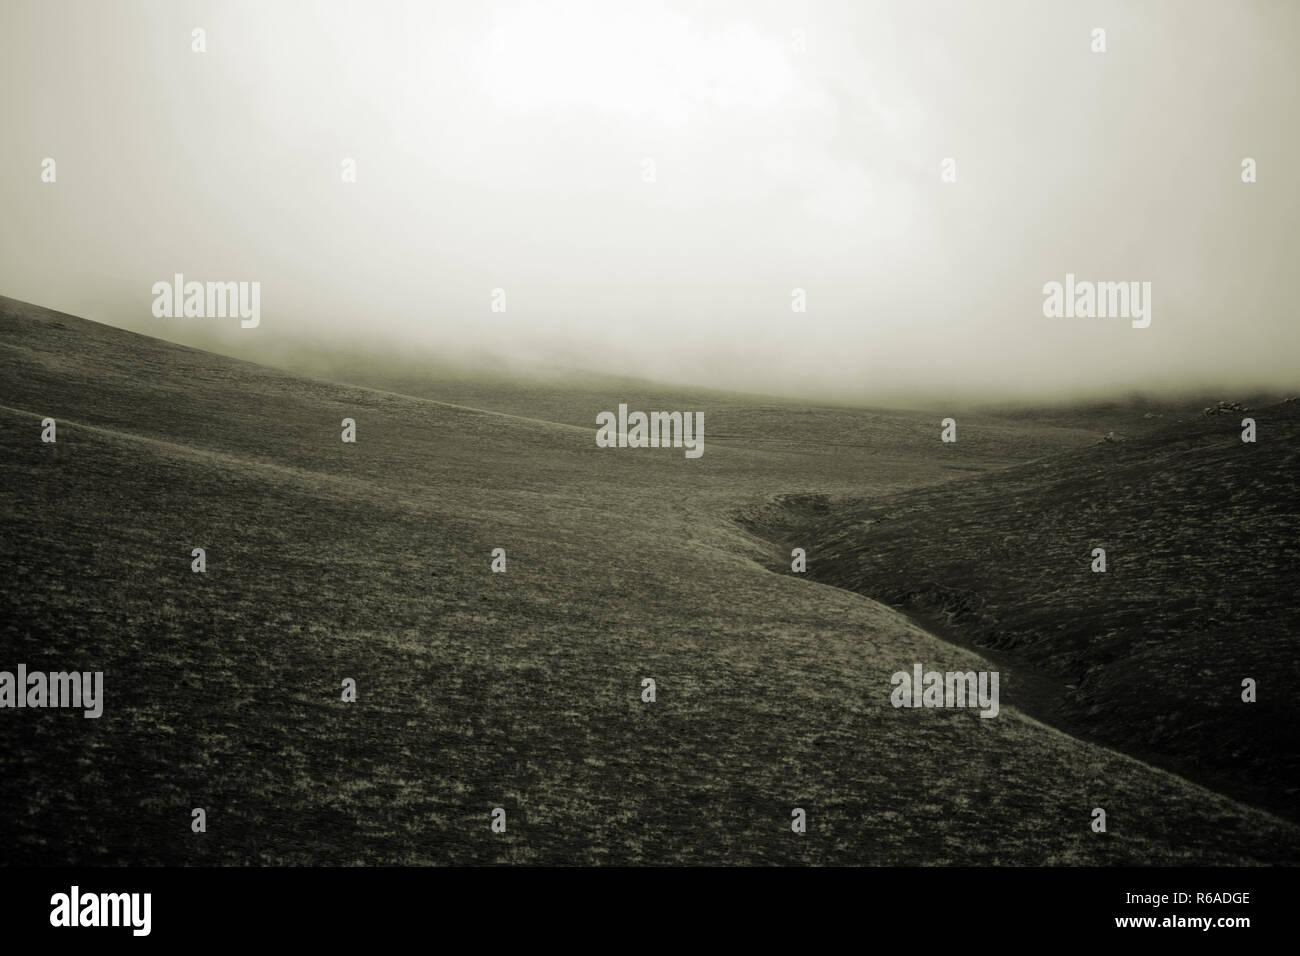 Fog On The Prairie Hills - Stock Image